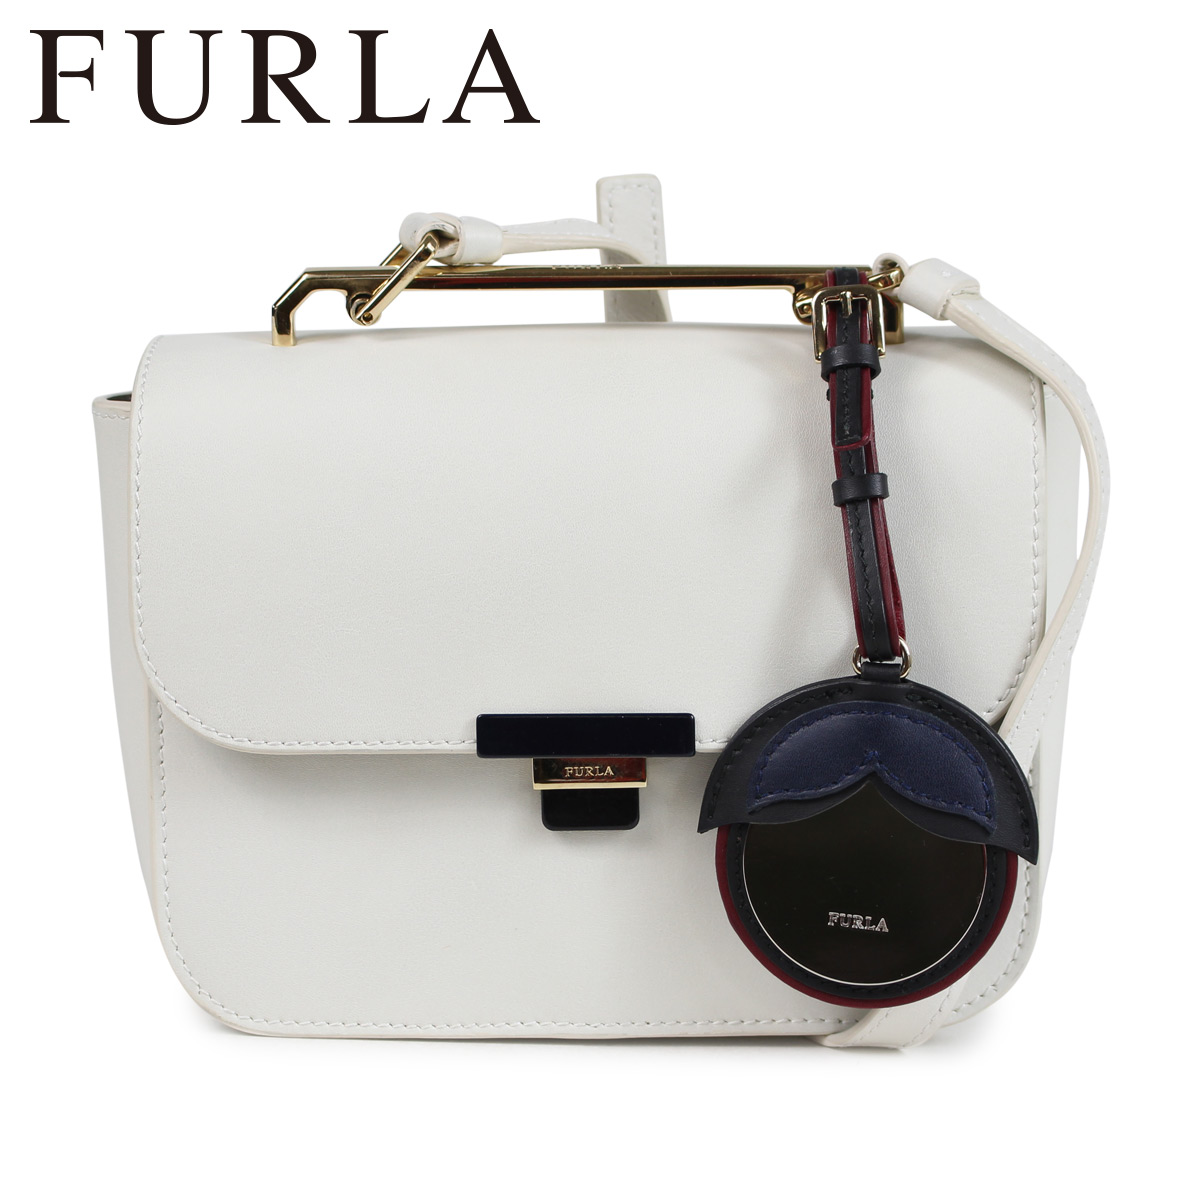 FURLA フルラ バッグ ショルダーバッグ レディース ELISIR MINI CROSS BODY BAG ホワイト 920940